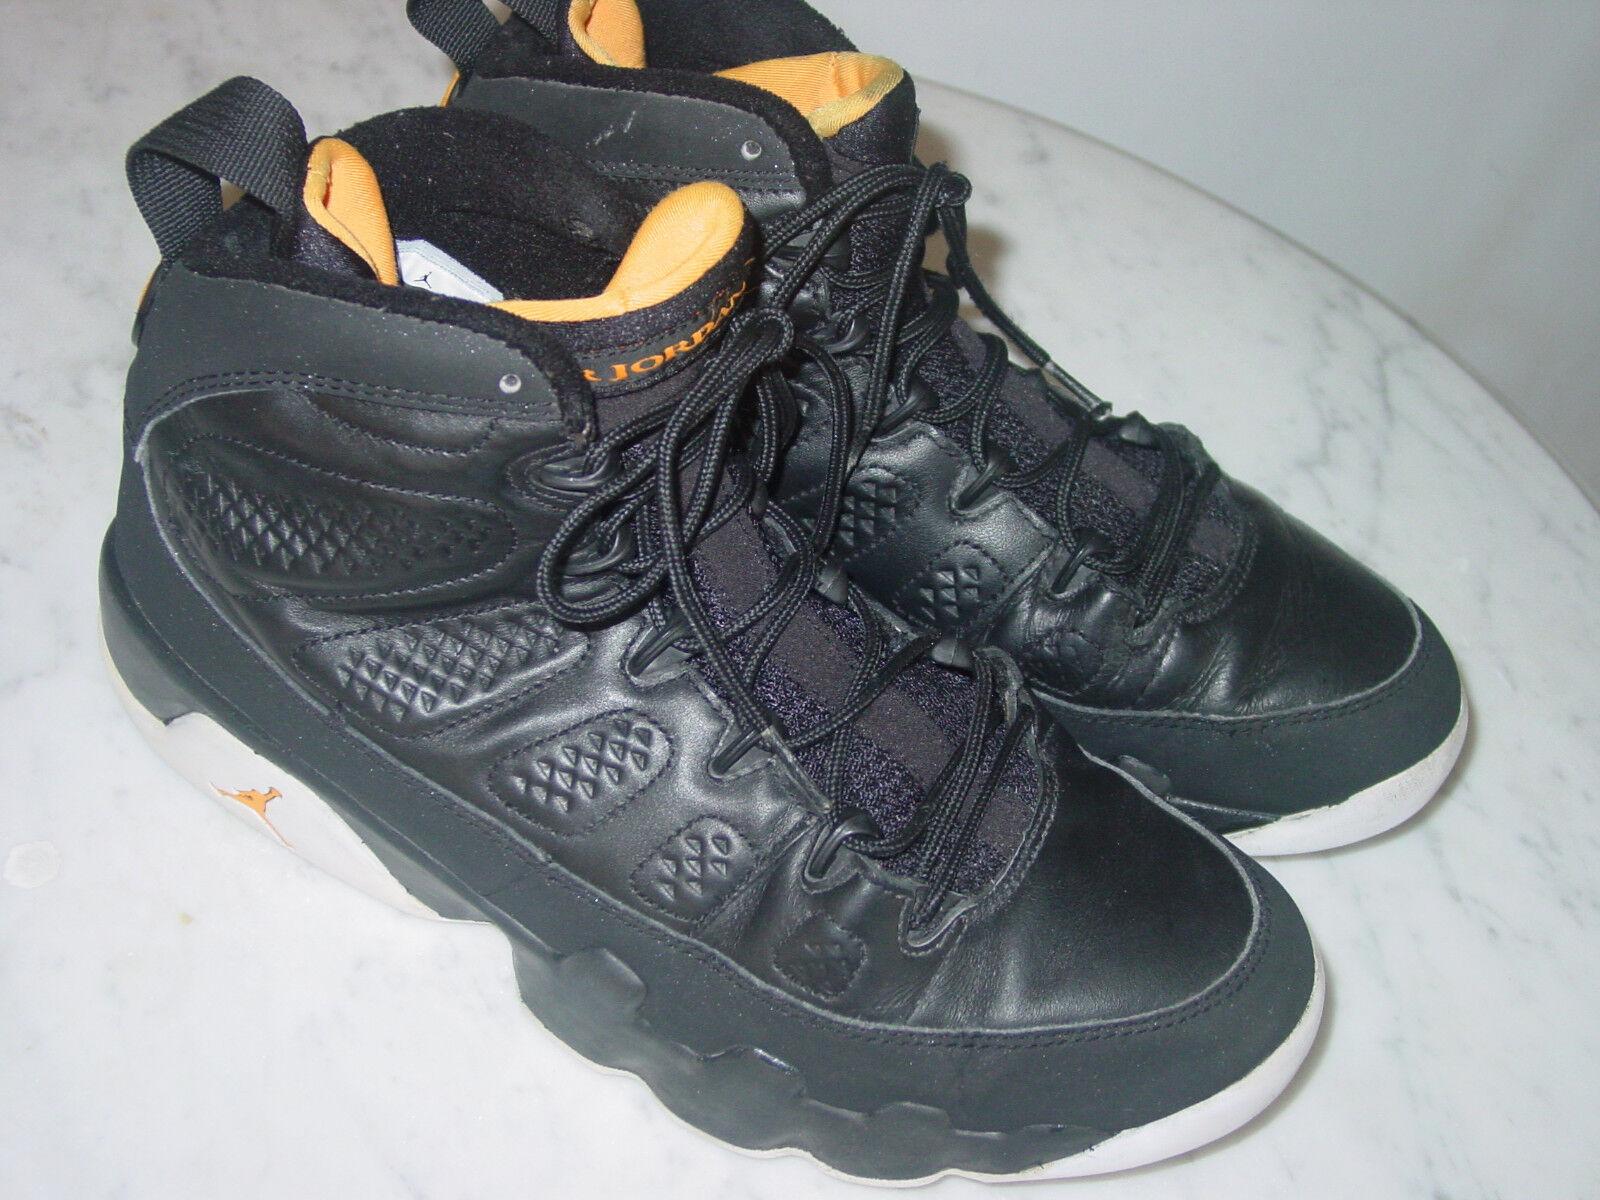 ad9ee7a330ce 2010 Nike Air Jordan Retro 9